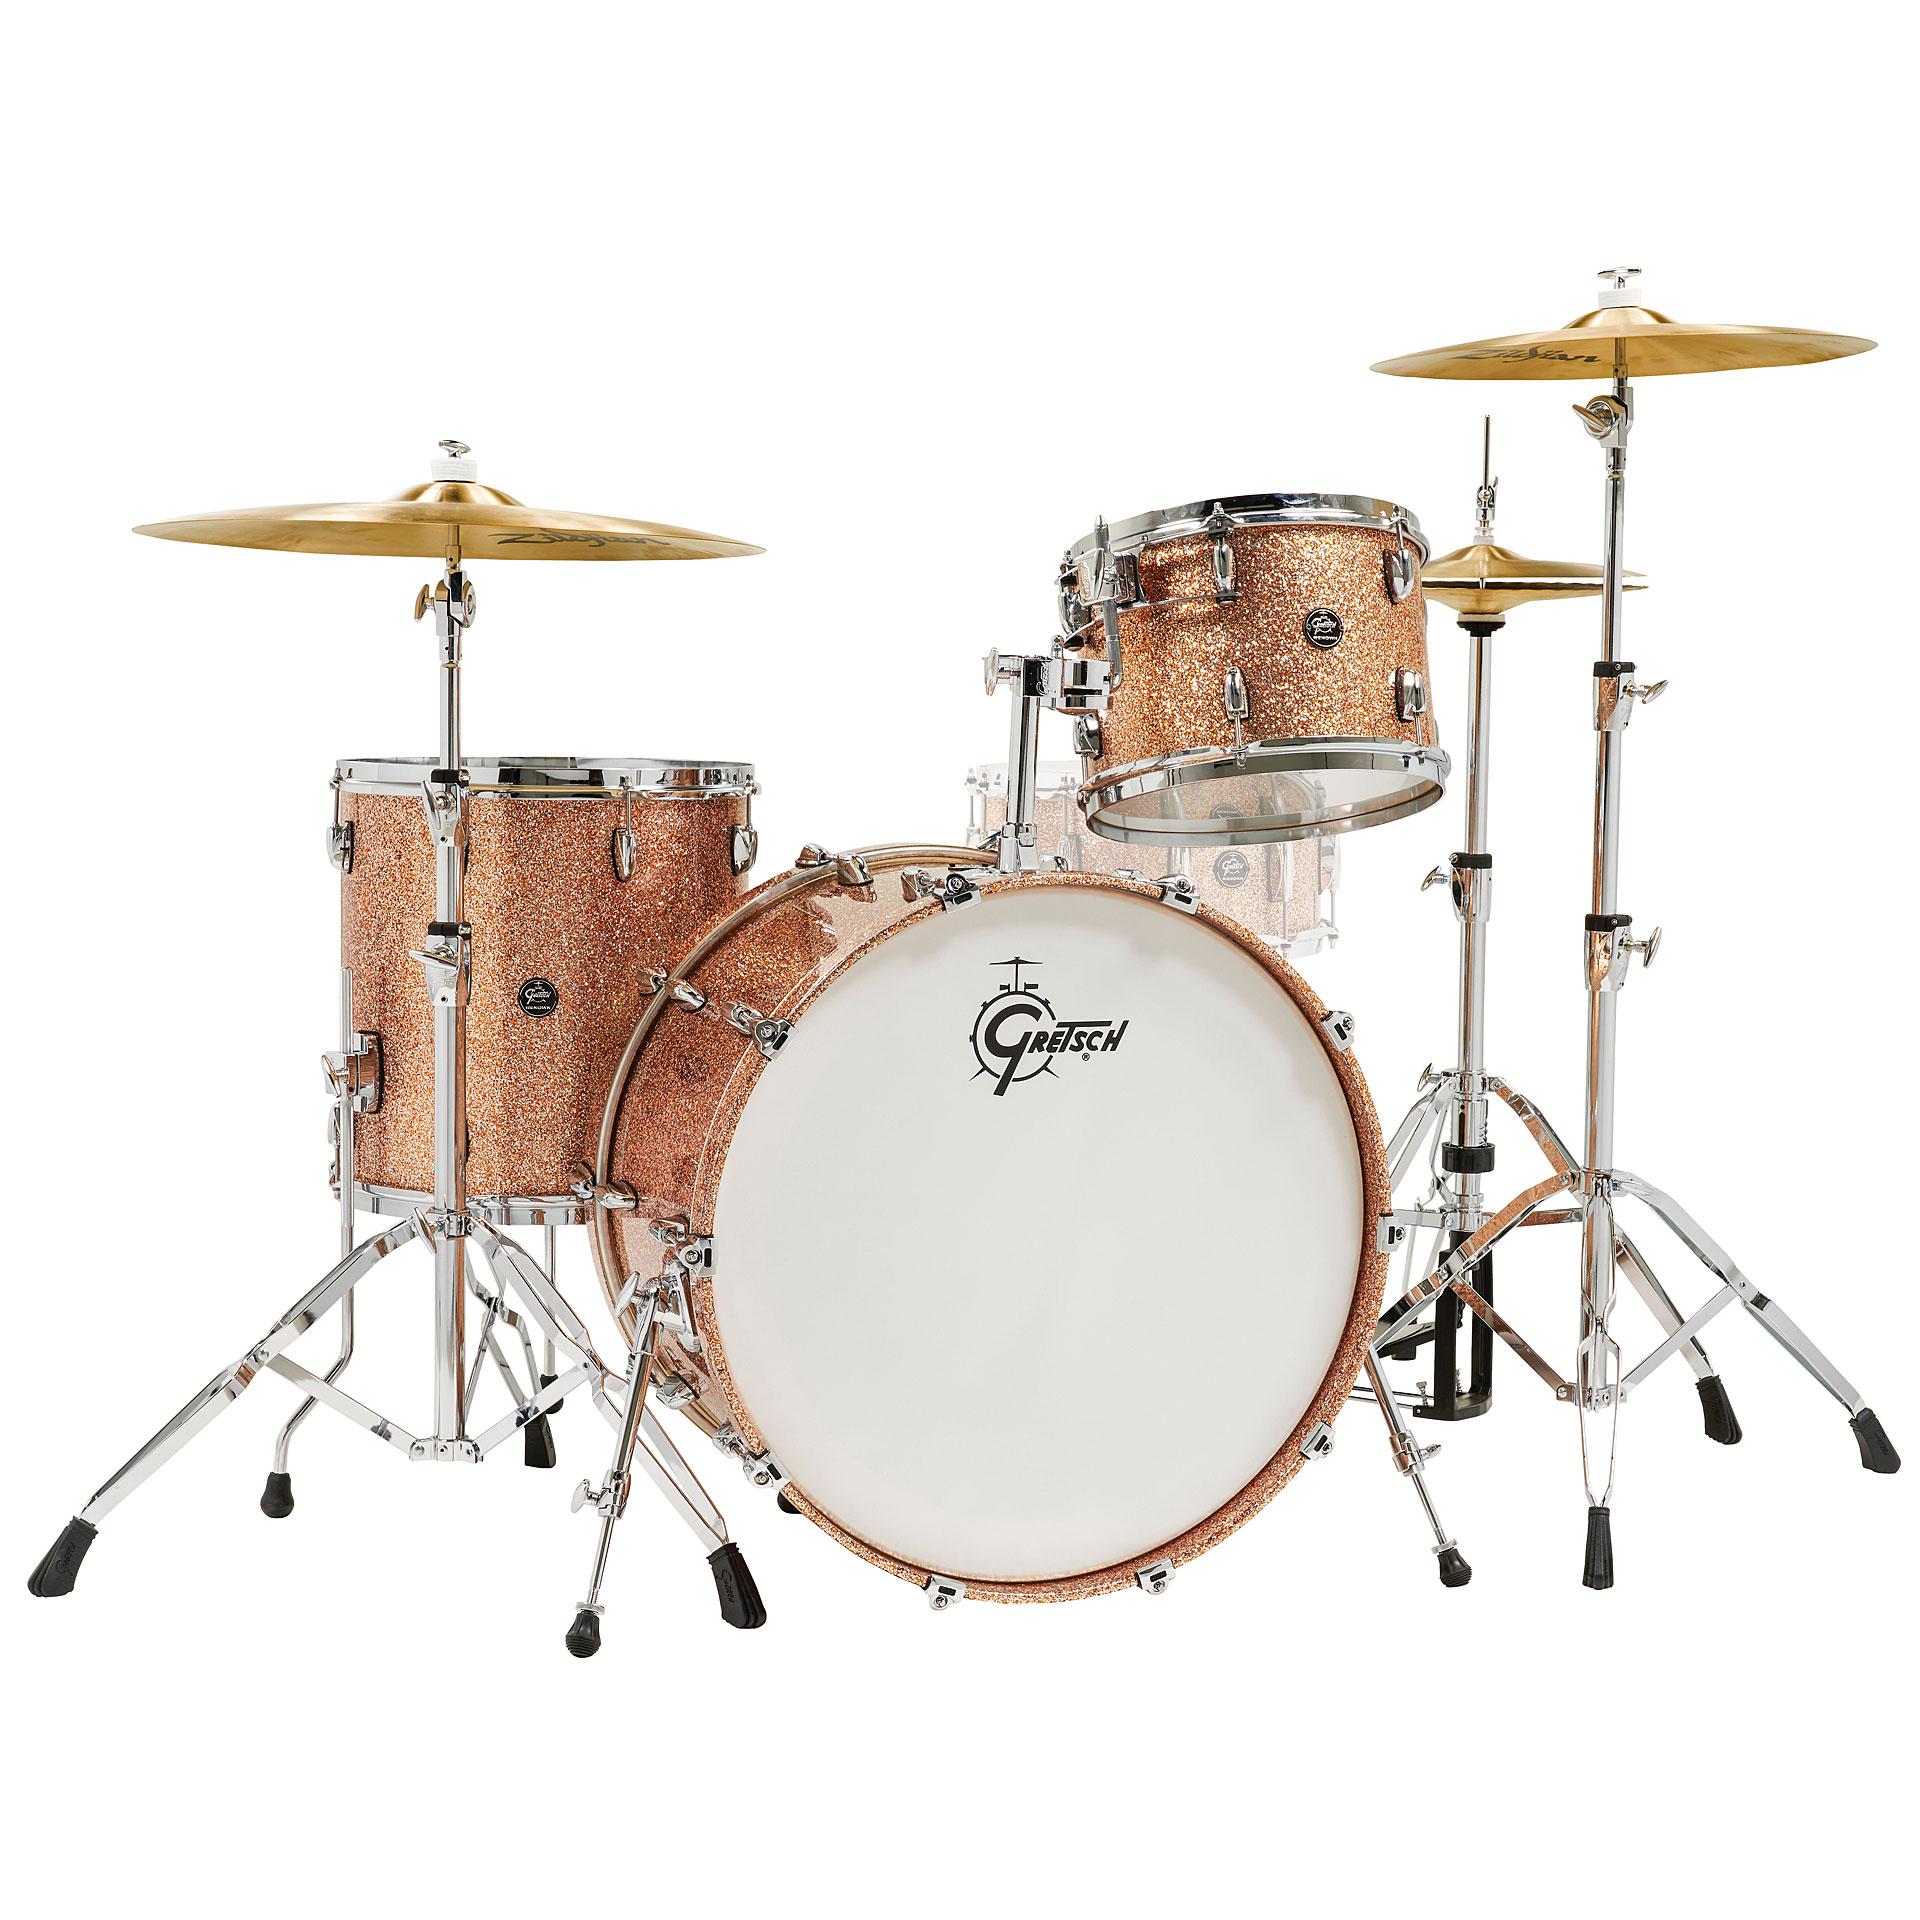 gretsch drums renown maple 24 copper premium sparkle shell set drum kit. Black Bedroom Furniture Sets. Home Design Ideas